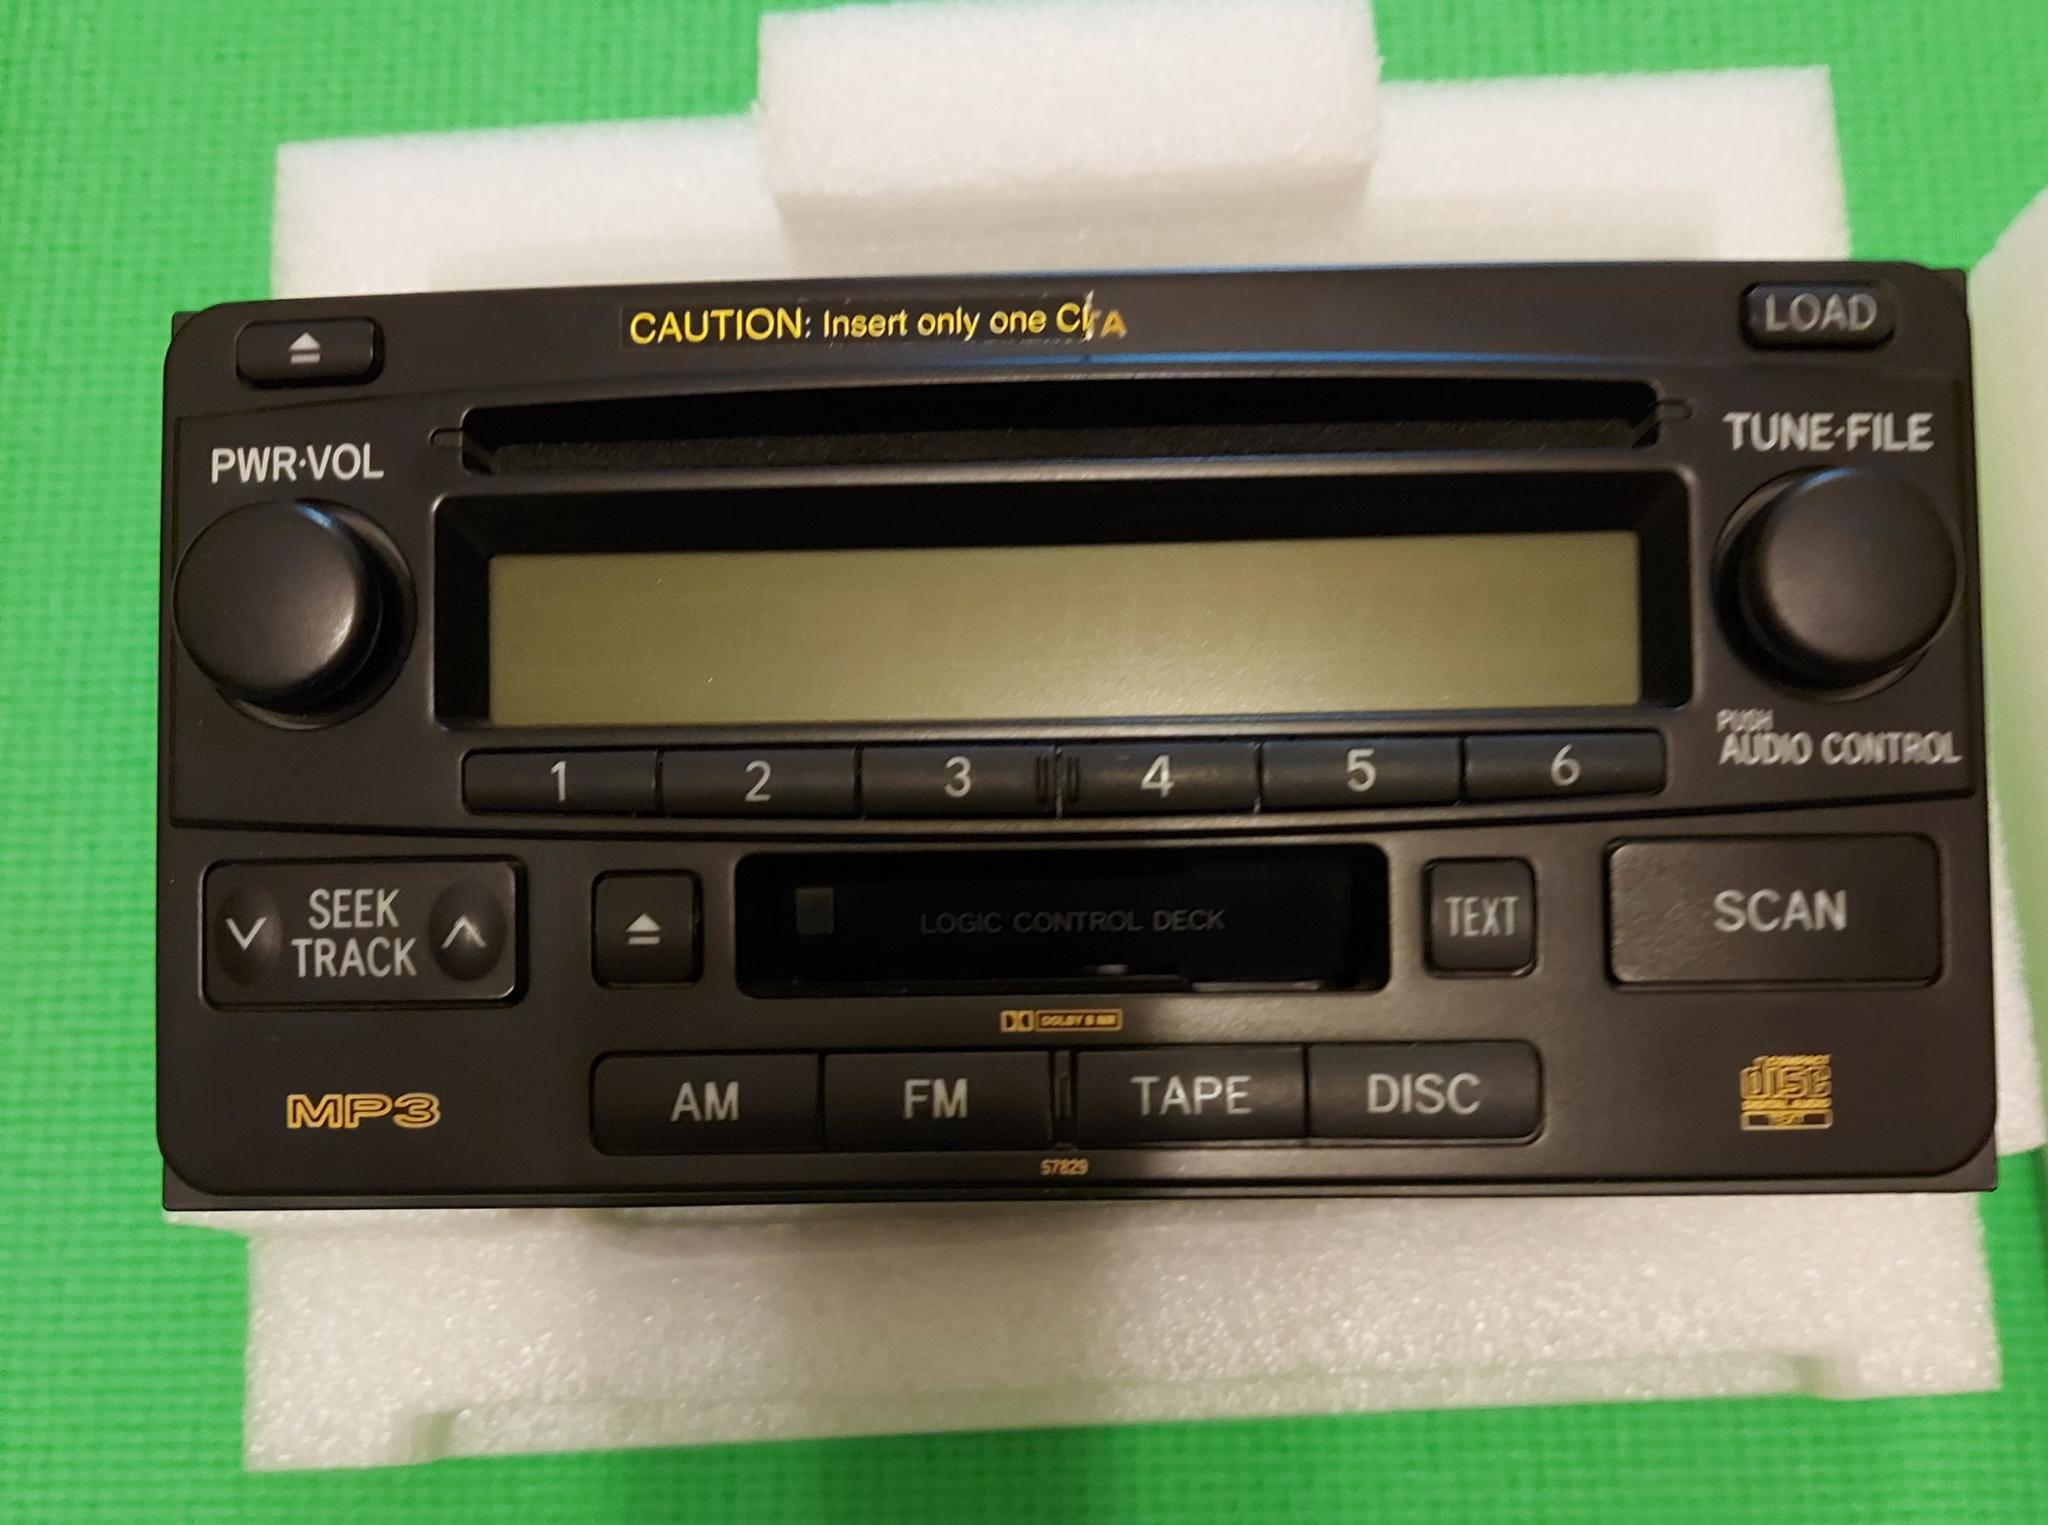 Land Cruiser original Tape CD and cassette player